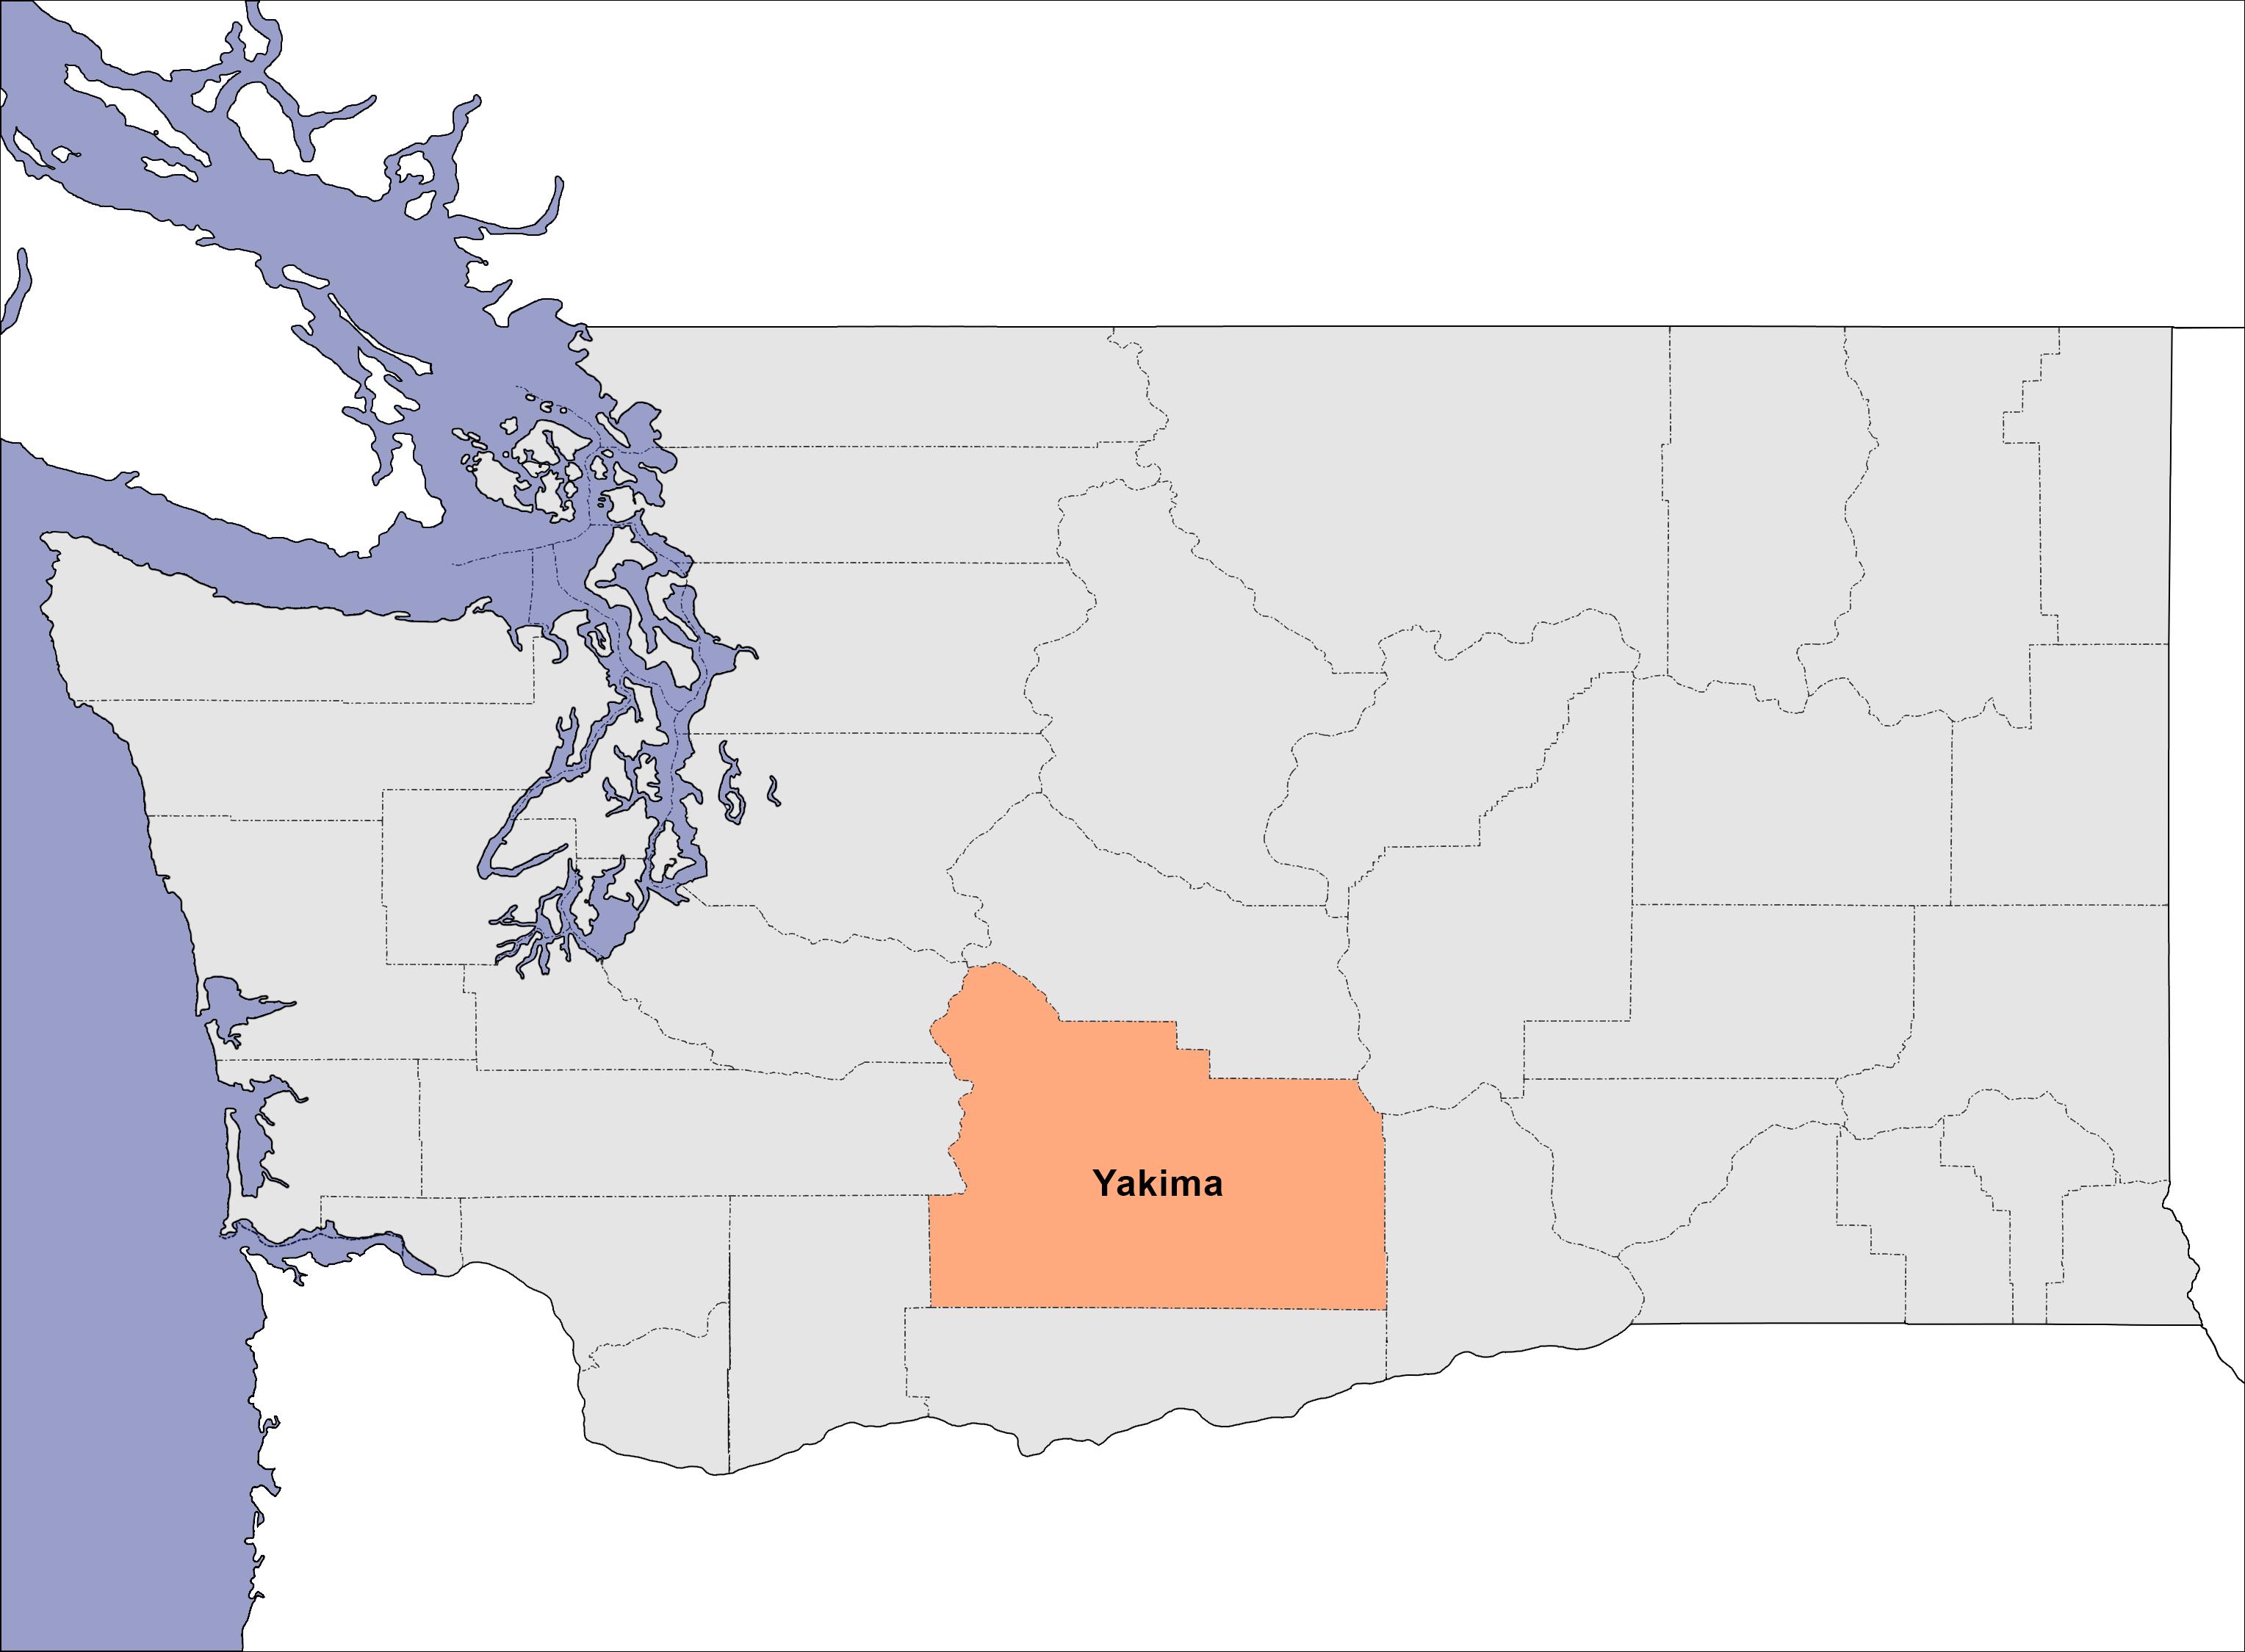 Yakima County on whatcom county, yakima wa history, northwest ga county map, pierce county, wenatchee county map, spokane county, san juan county, lewis county, grays harbor county, yakima area wineries, roosevelt county map, chelan county map, columbia county, yakima weather, yakima union gap wa, lincoln county, skagit county, clark county map, yakima washington, snohomish county, yakima indian clothing, charlottesville county map, king county, okanogan county, ketchikan county map, mount rainier national park map, jefferson county, kitsap county, clark county, grant county, benton county, yakima eisenhower high school, yakima mall, washington map, riverside county map, rowan county ky map, franklin county, yakima restaurants,